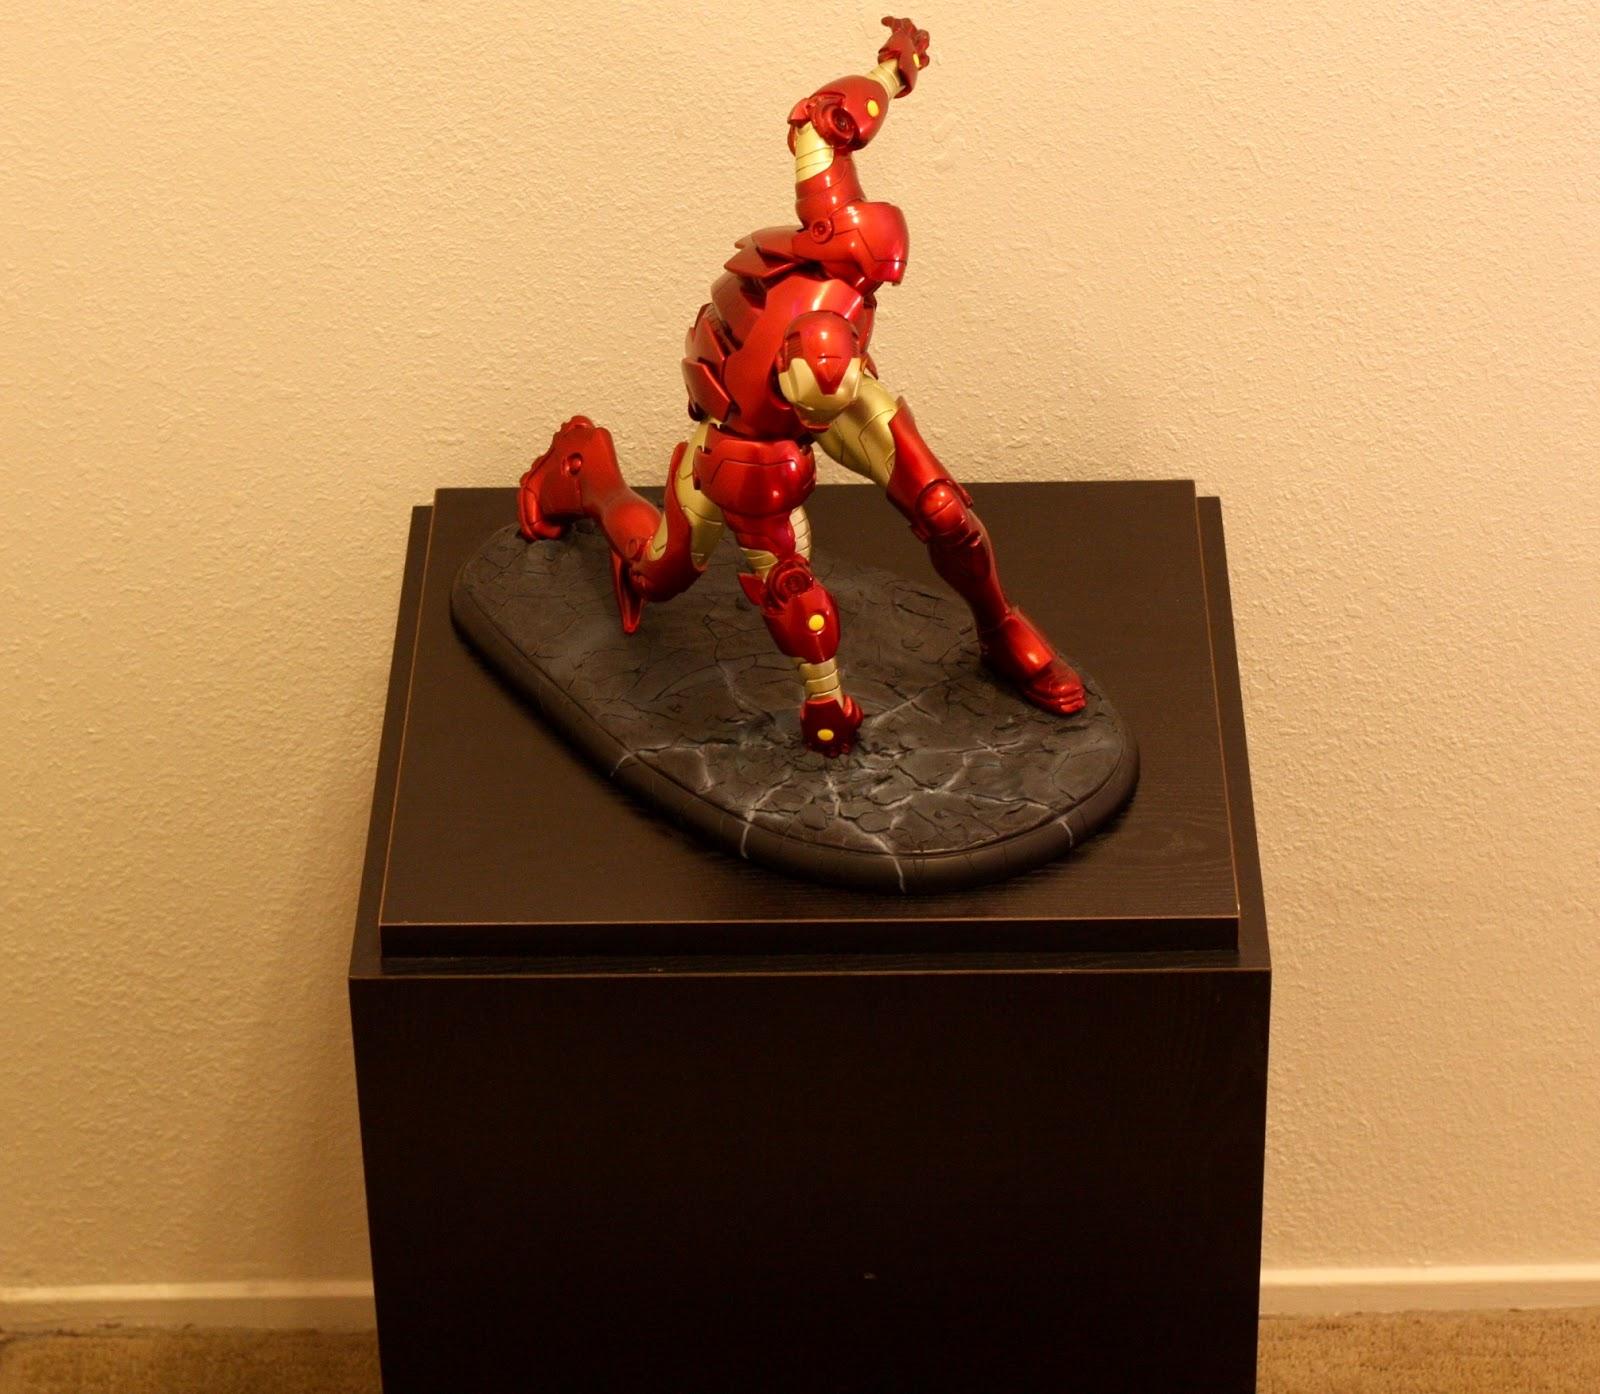 Geek Diy Bam Iron Man Statue Pedestal Display Stand Diy